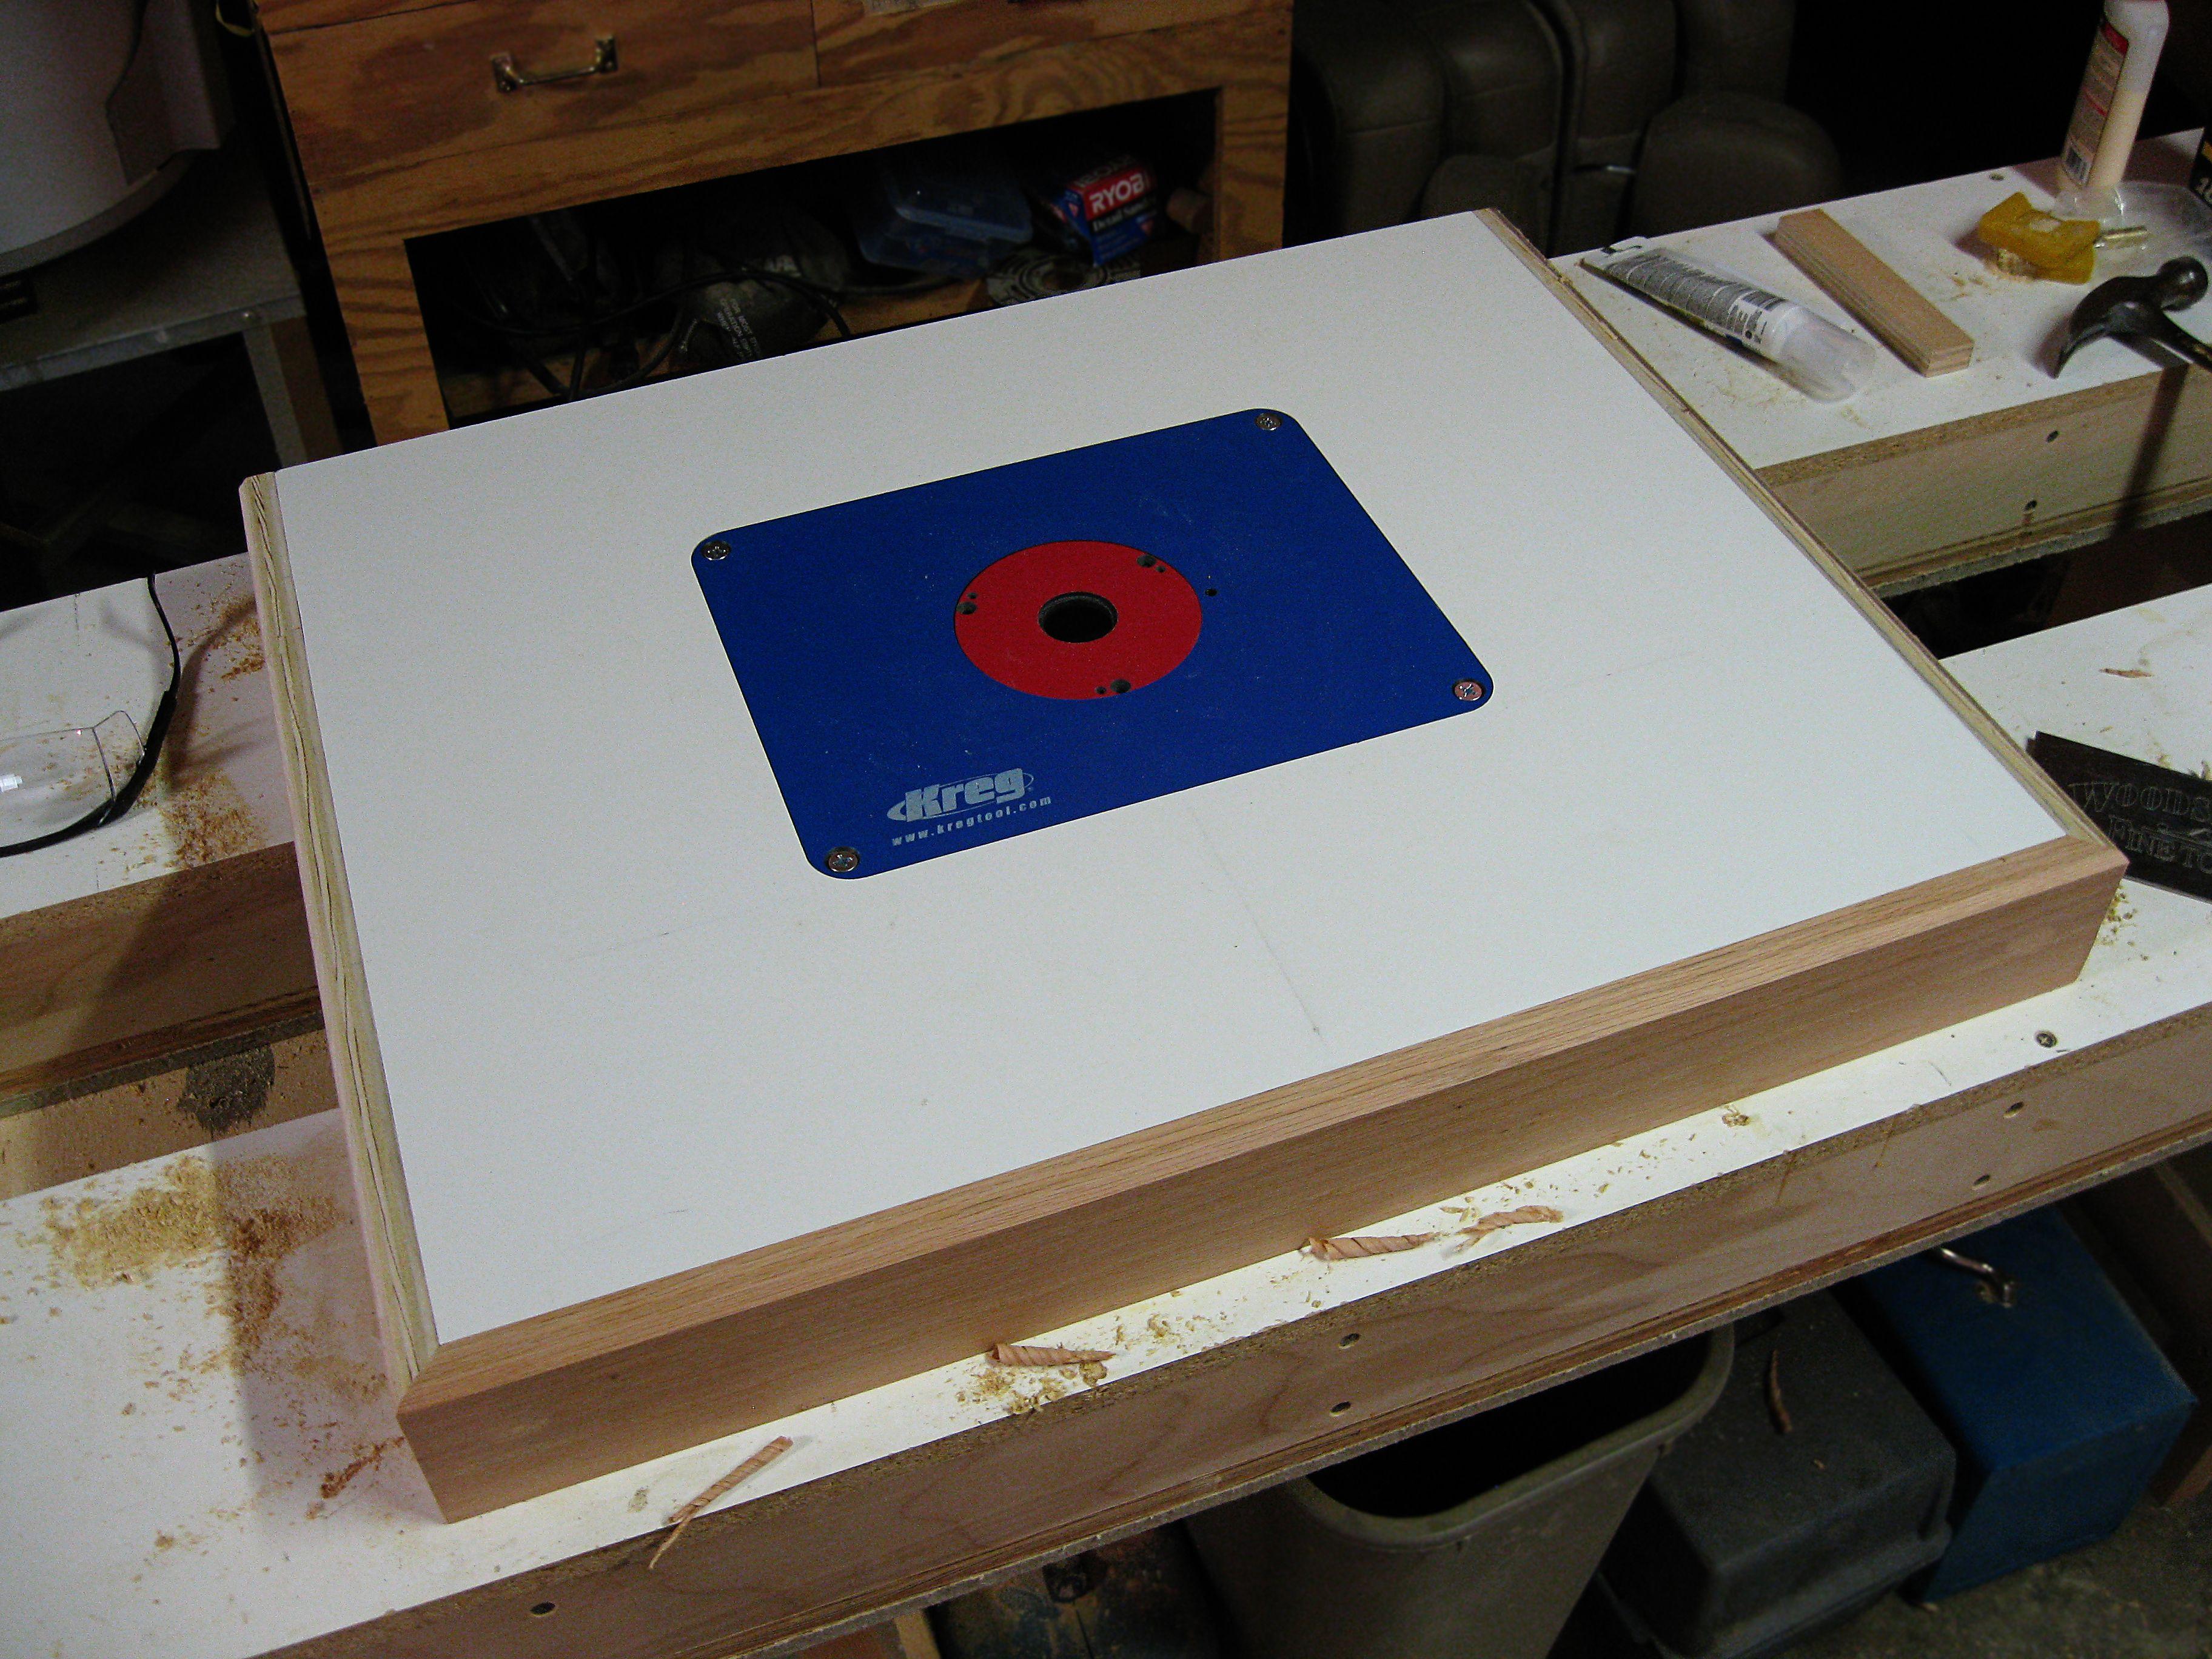 Woodwork kreg jig router table plans pdf plans woodworking woodwork kreg jig router table plans pdf plans keyboard keysfo Image collections